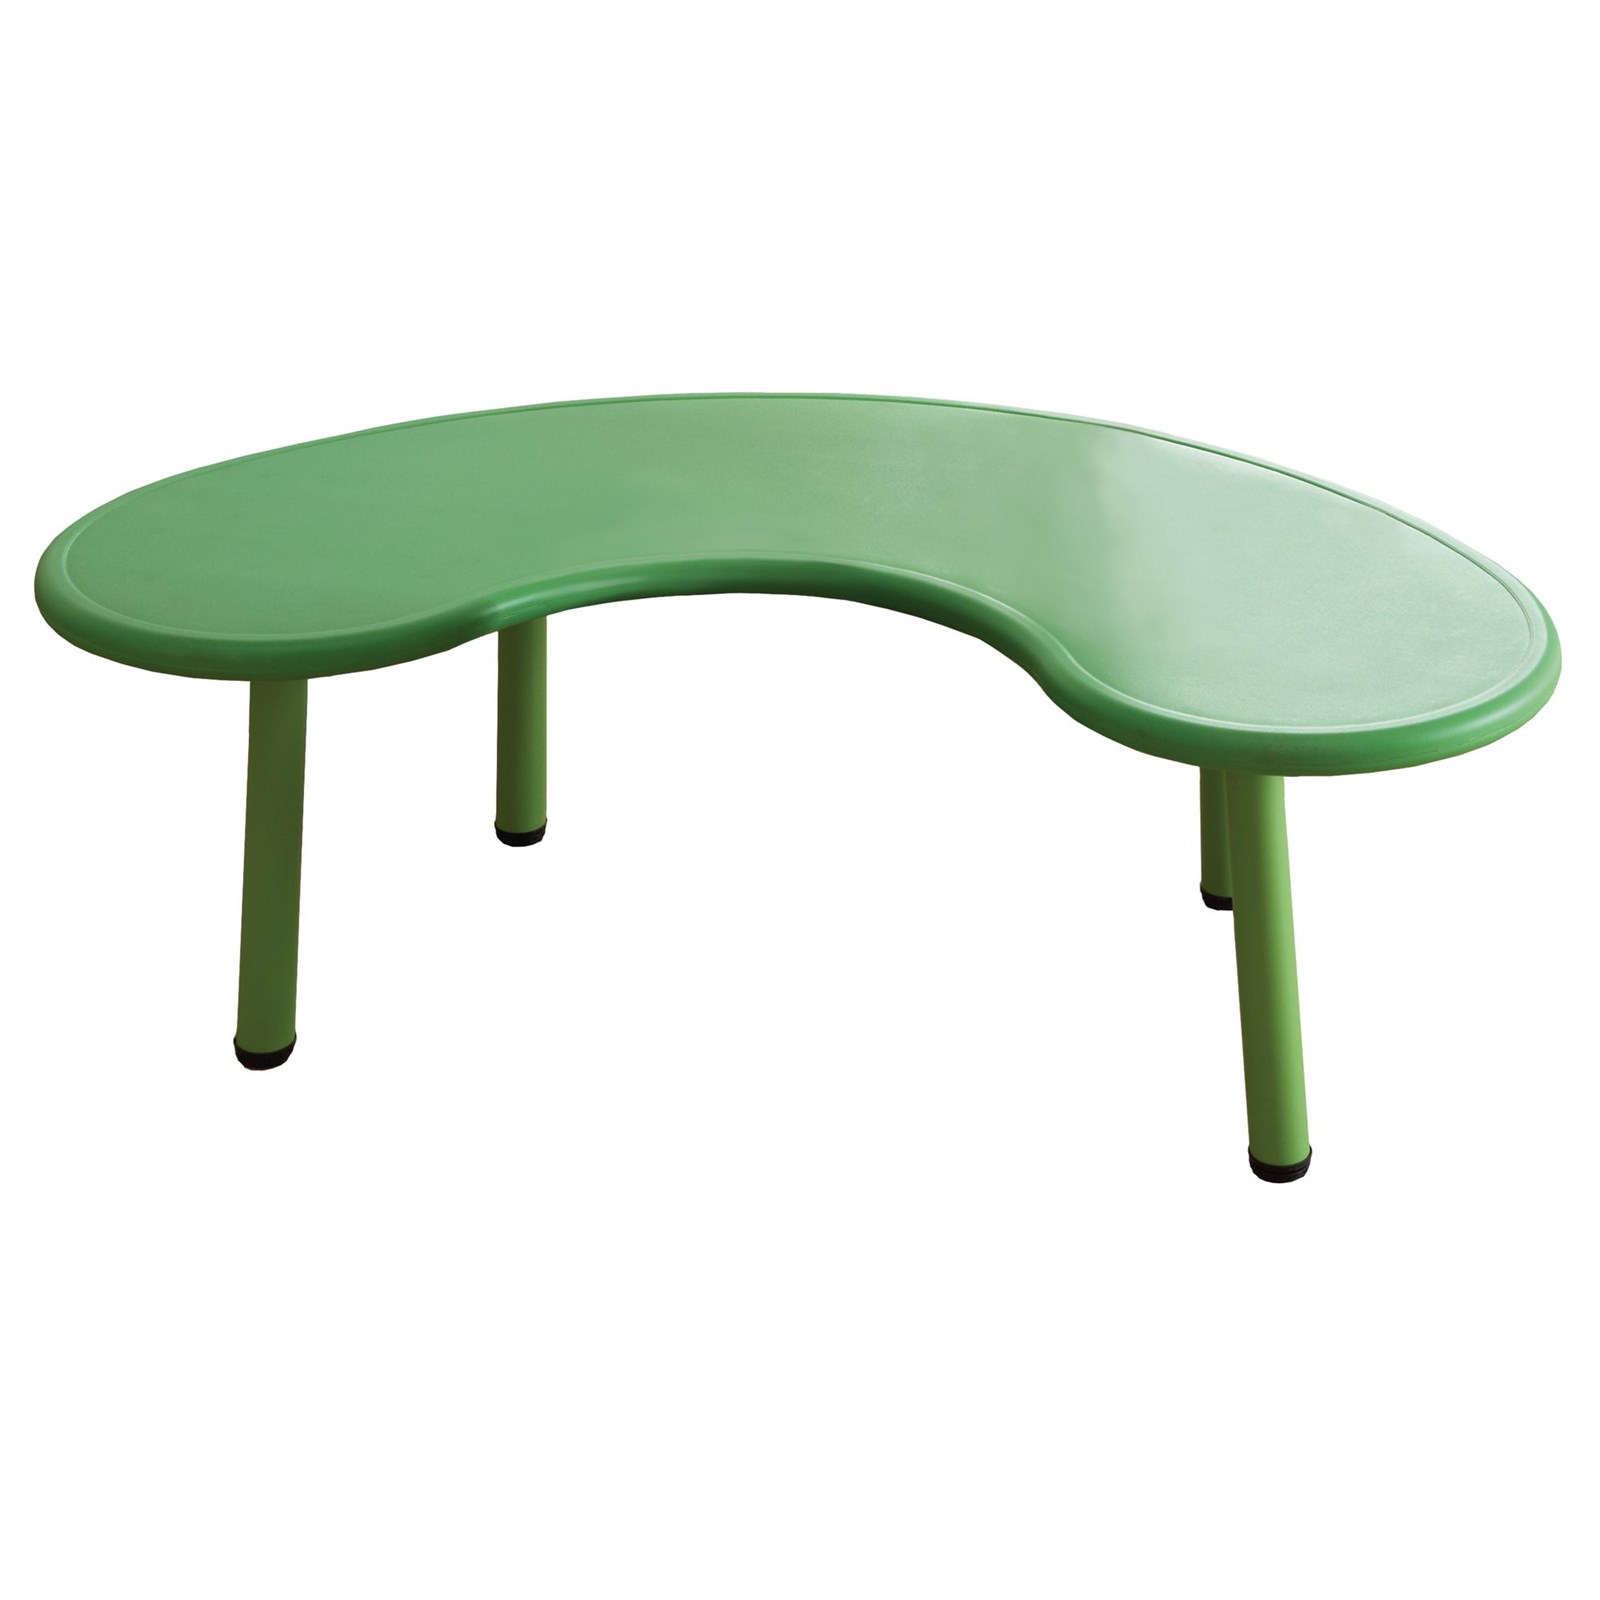 Profile Kidney Weatherproof Plastic Classroom Table 1650 x 900 x